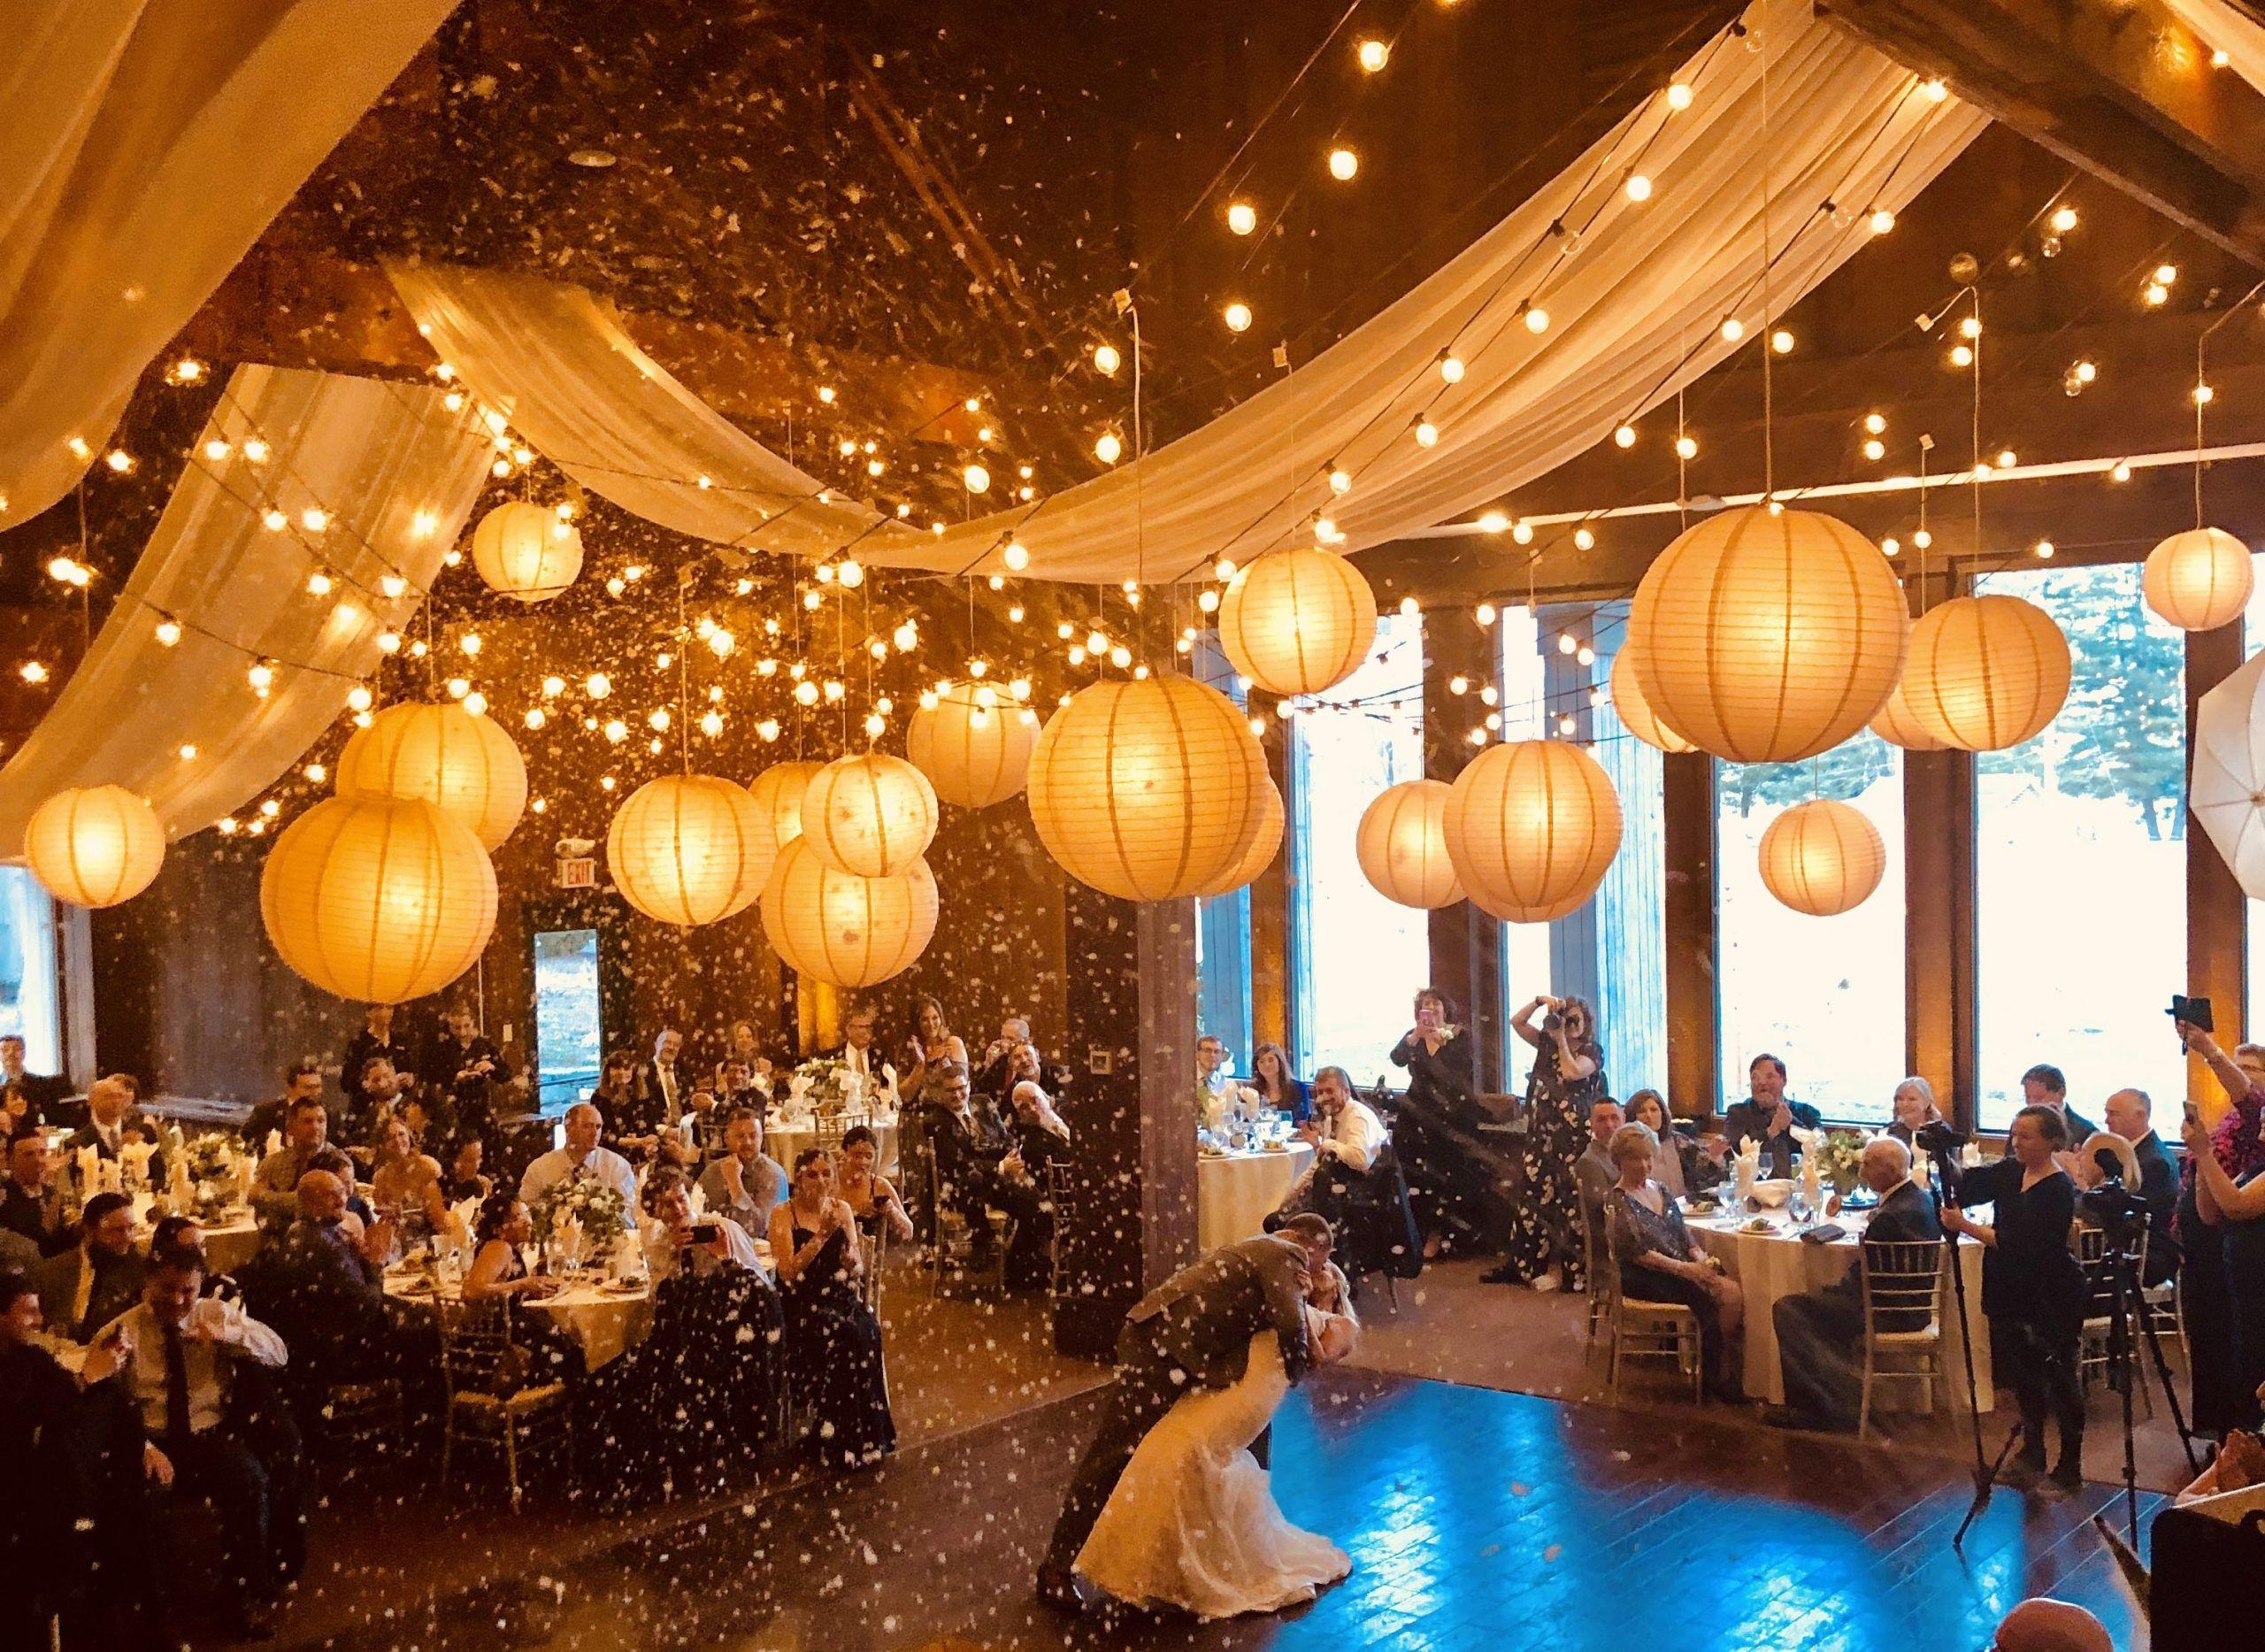 First Dance Snow - #Dance #Snow #weddingdecorationslanterns -  #letitsnow #snowing #firstdance #vividevents #bistros